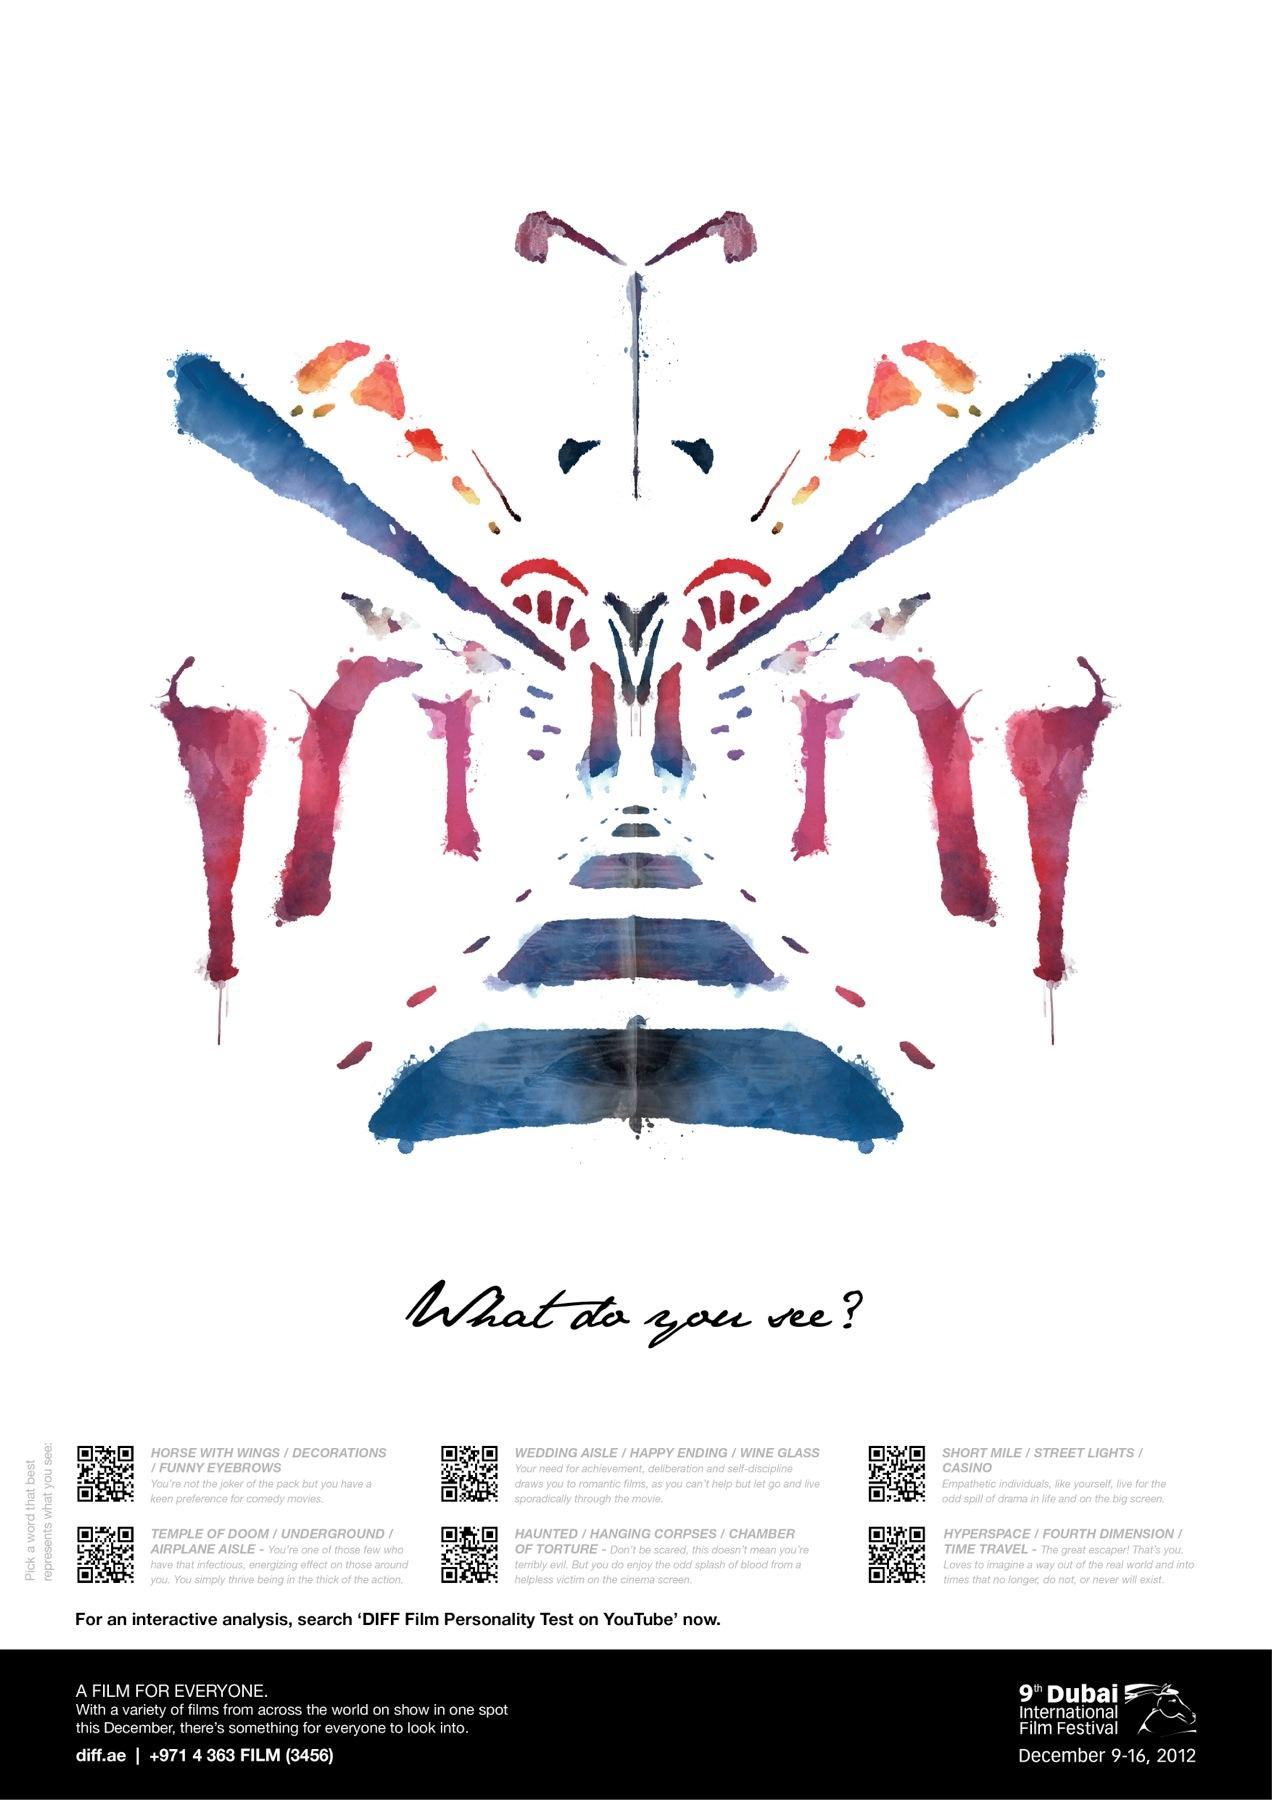 Dubai International Film Festival Outdoor Ad -  What do you see, 6